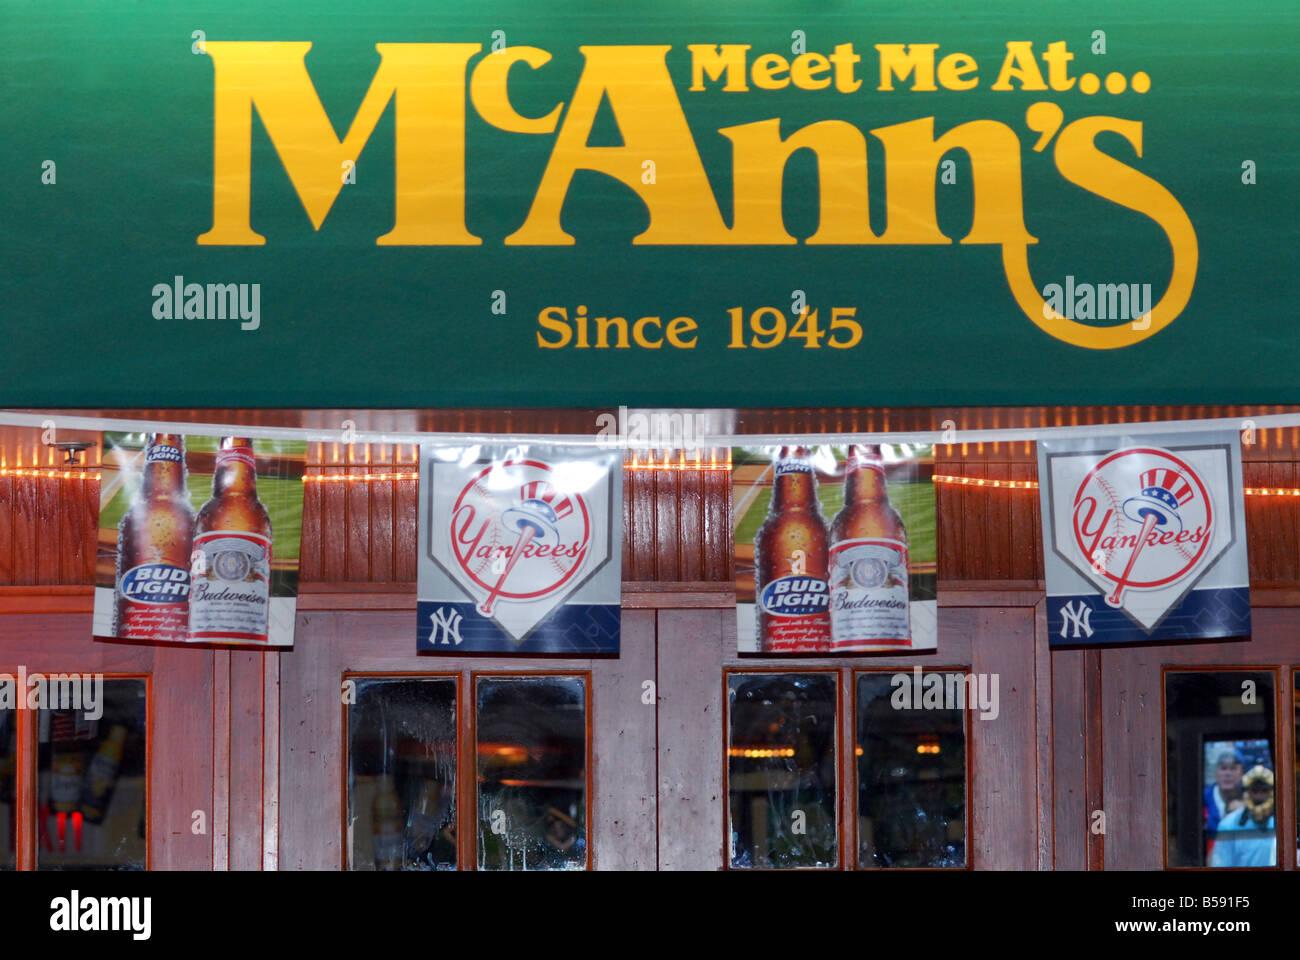 Meet Me at McAnn's Stock Photo